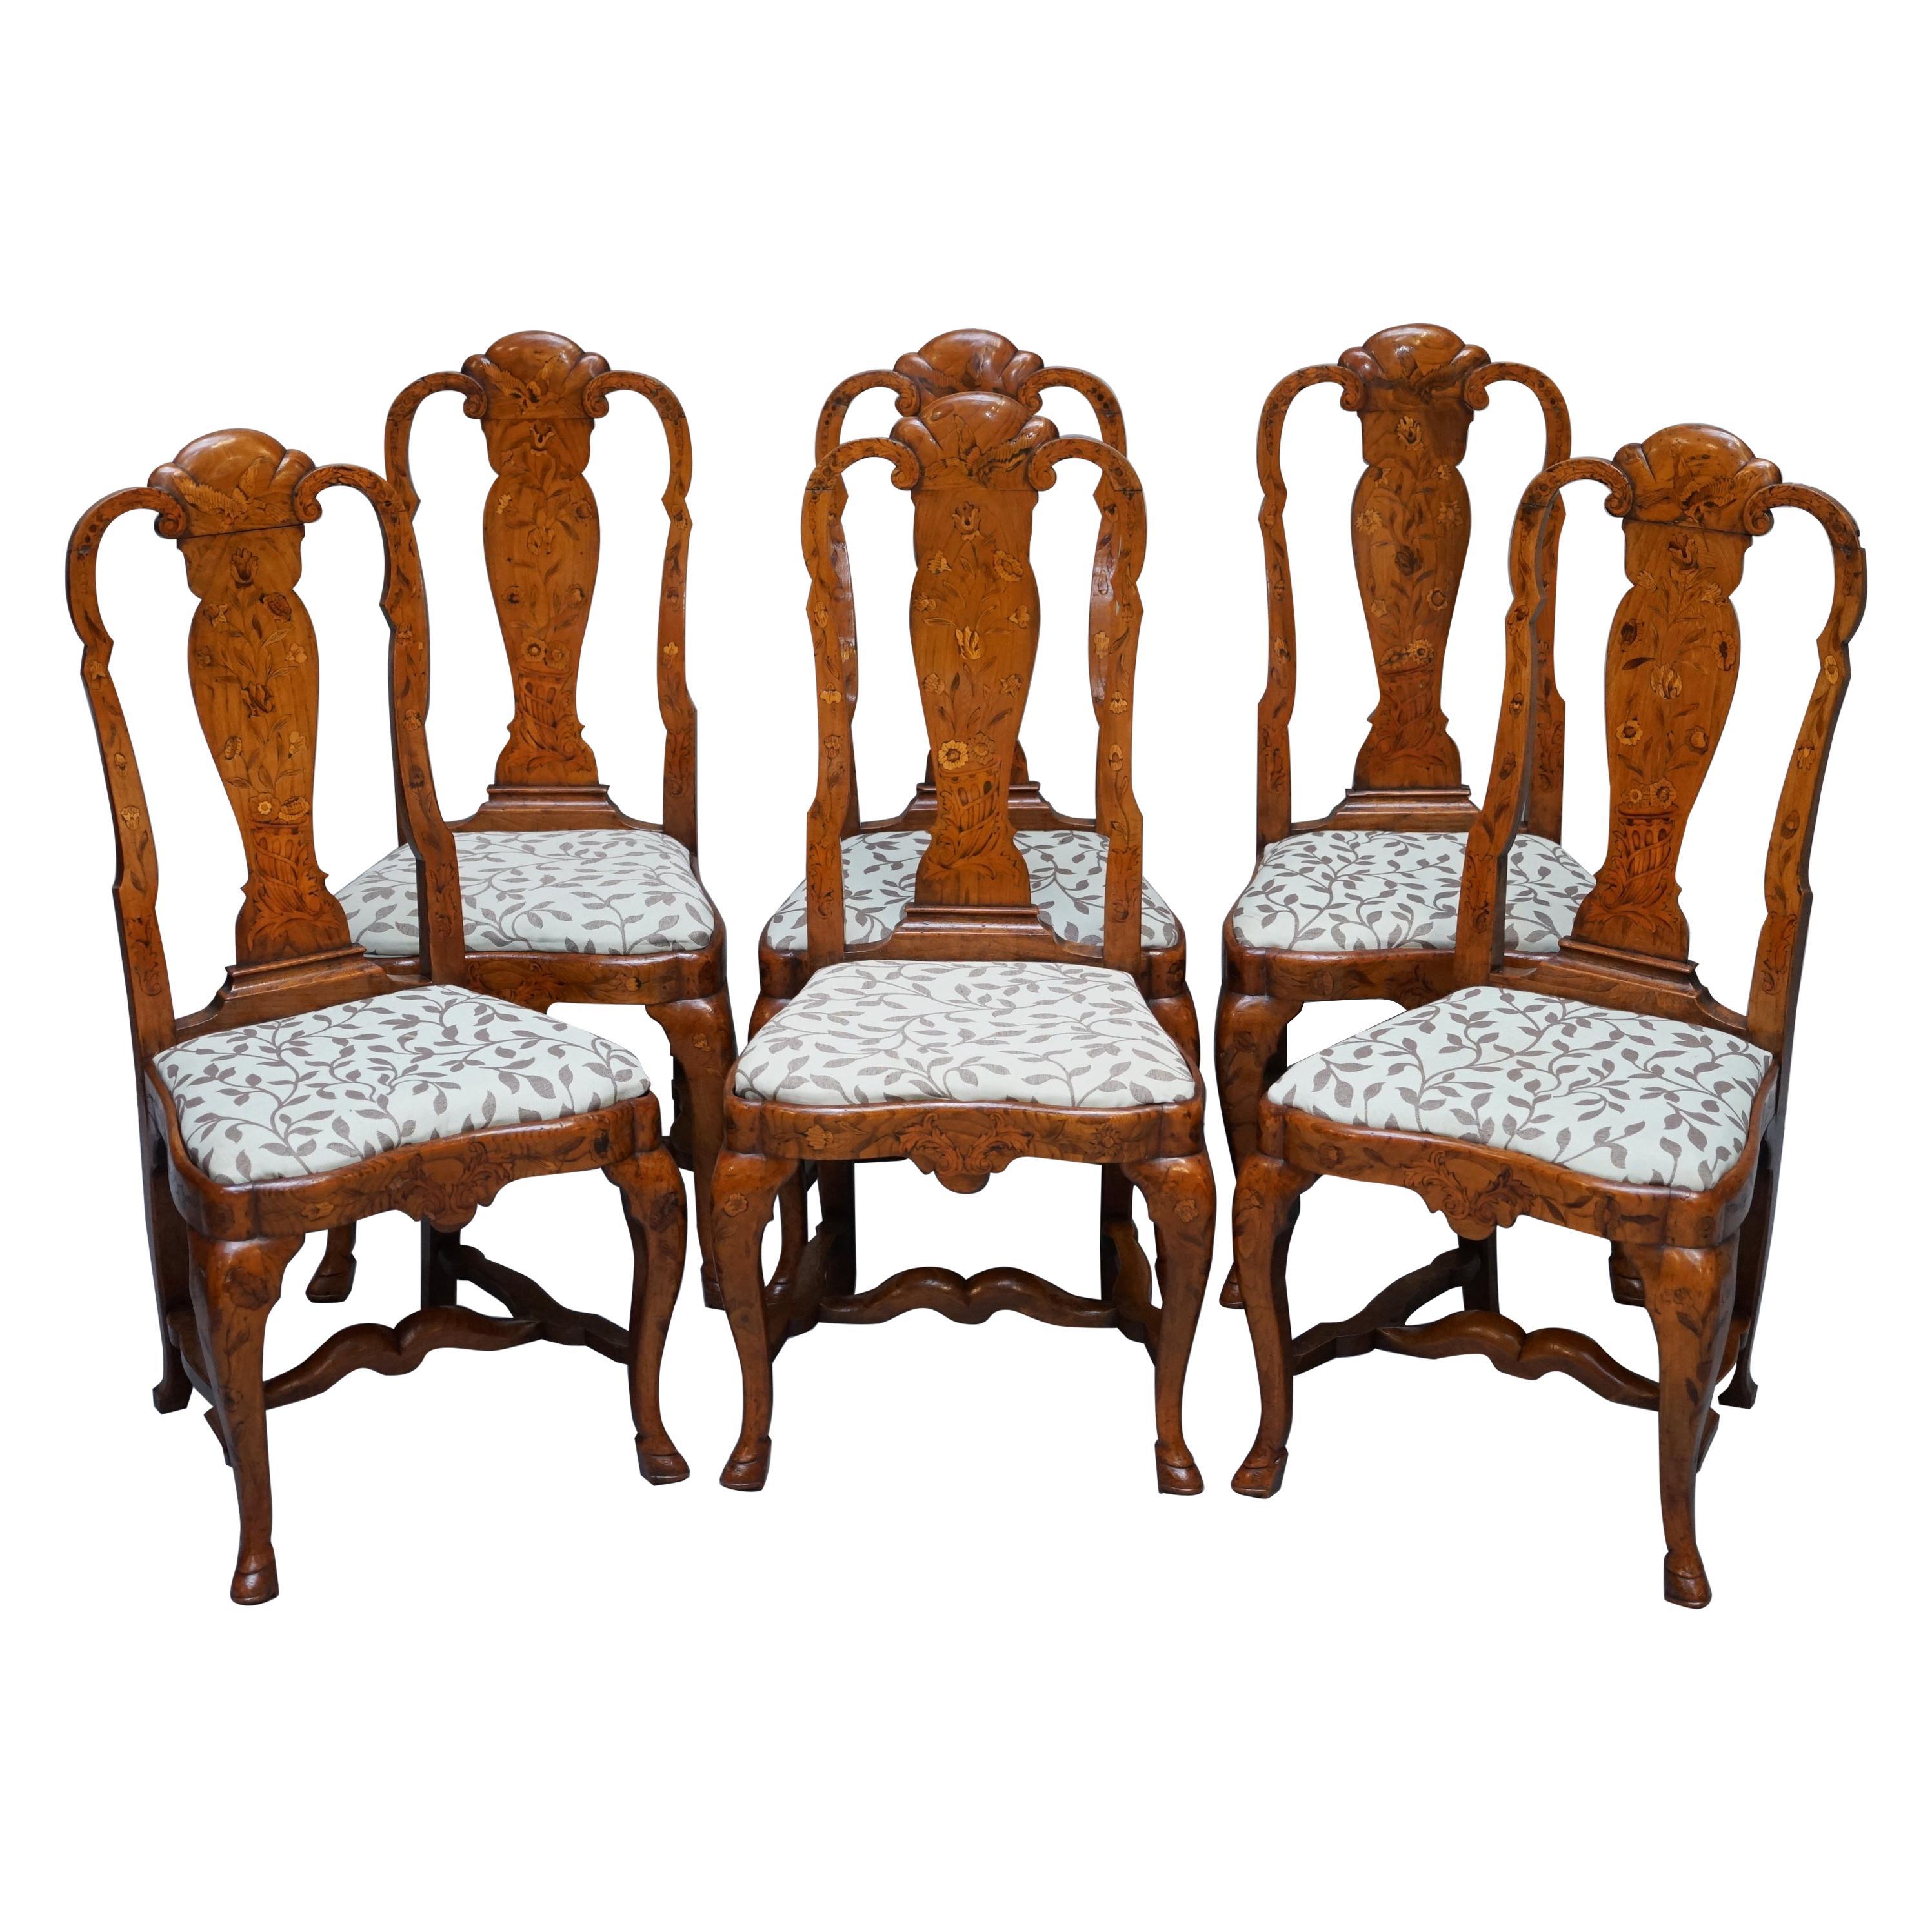 Rare Set of Six 18th Century circa 1760 Dutch Elm Marquetry Inlaid Dining Chairs